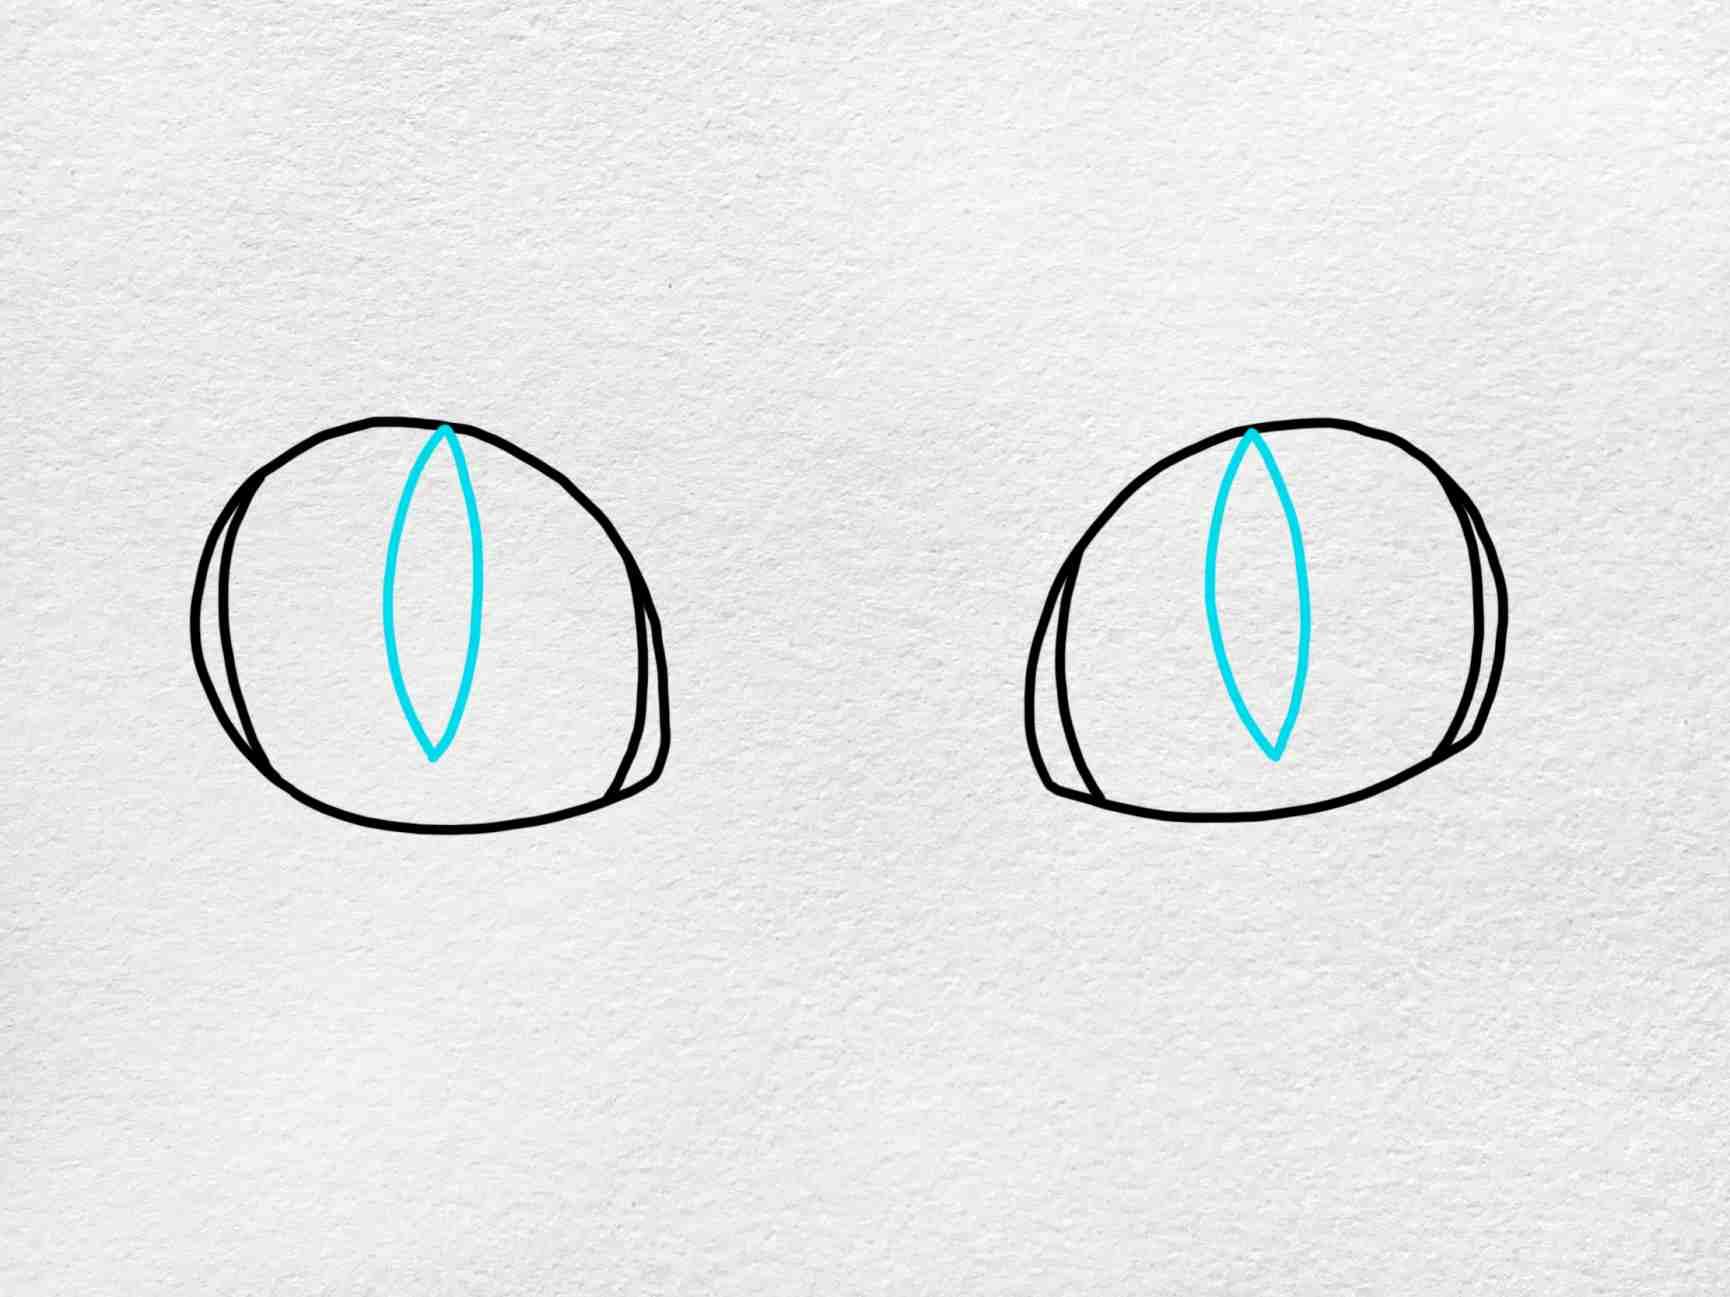 Cat Eyes Drawing: Step 4